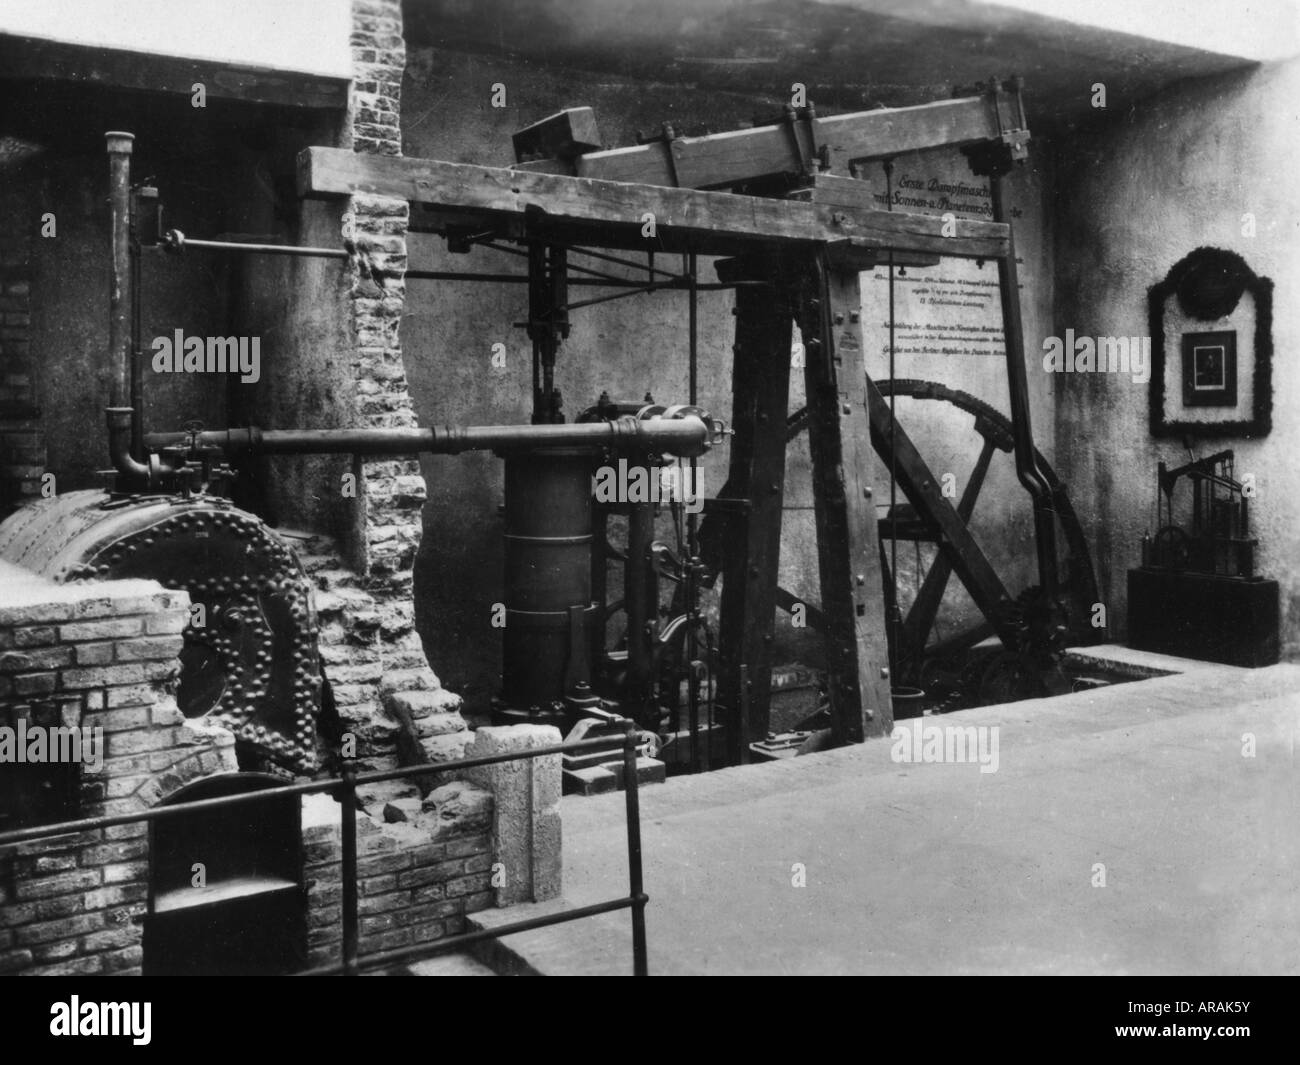 james watt steam engine diagram wiring 1992 gas club car golf cart stock photos & images - alamy